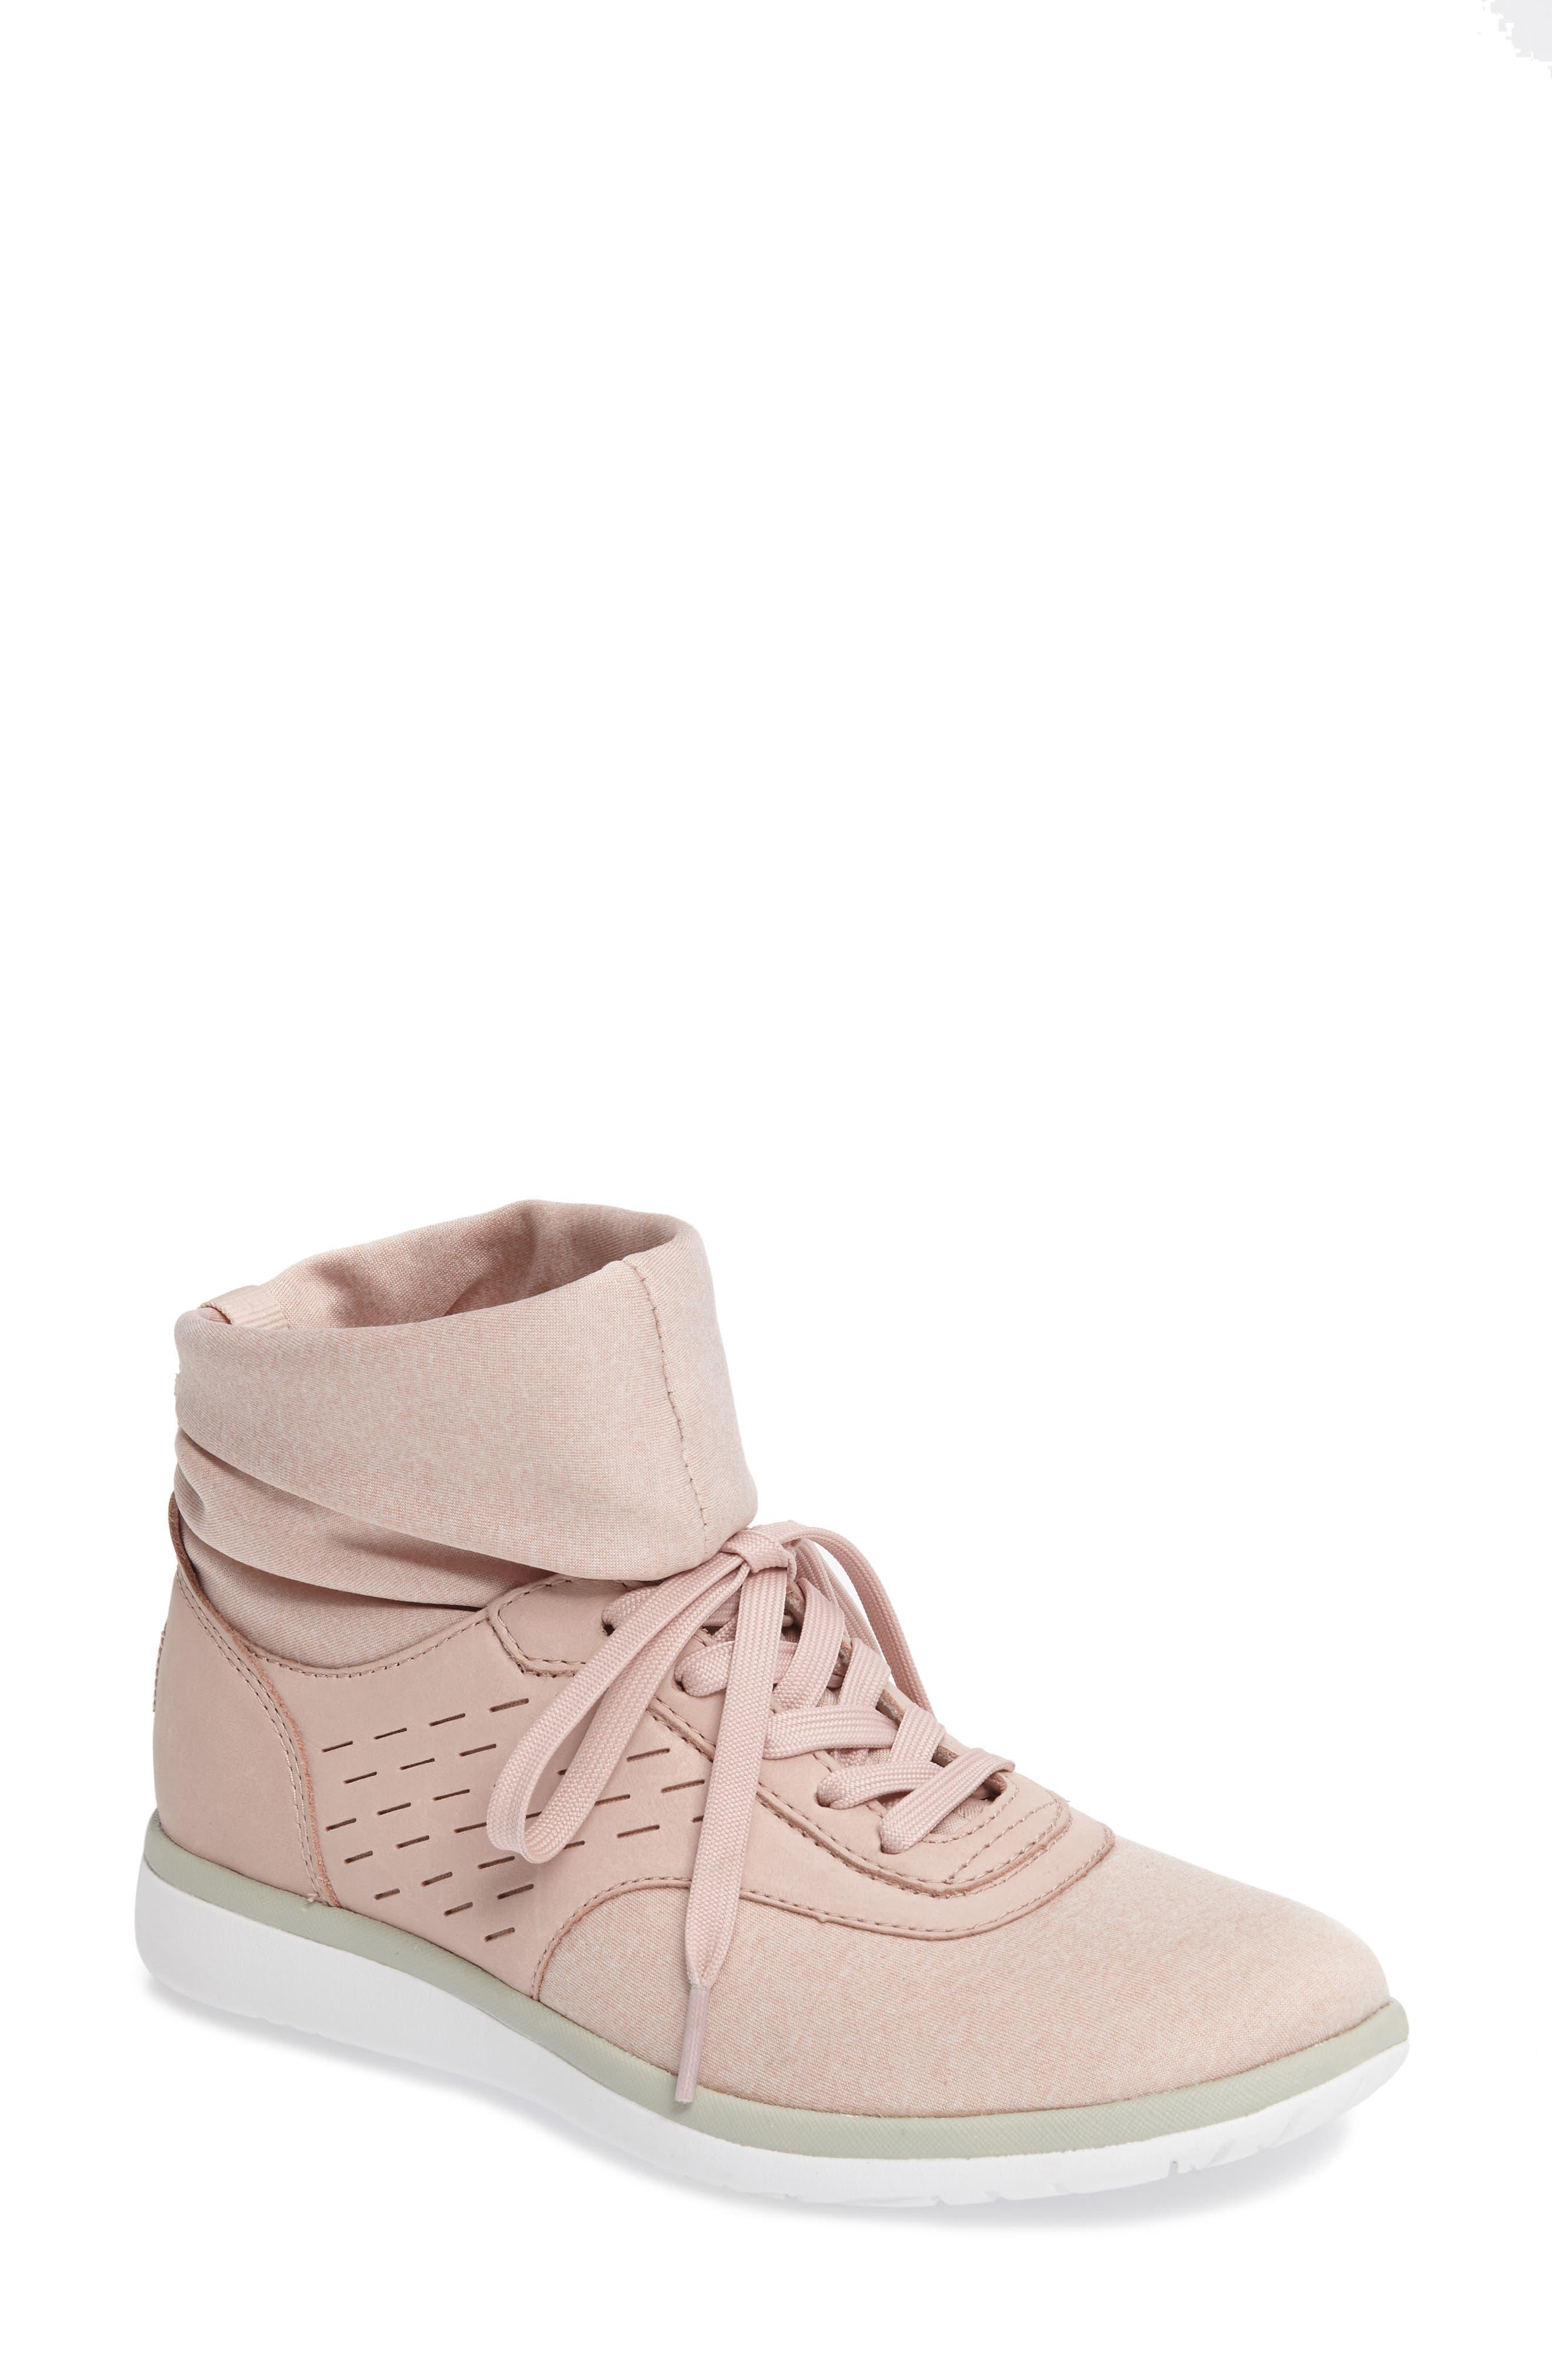 Alternate Image 1 Selected - UGG® Islay High Top Sneaker (Women)